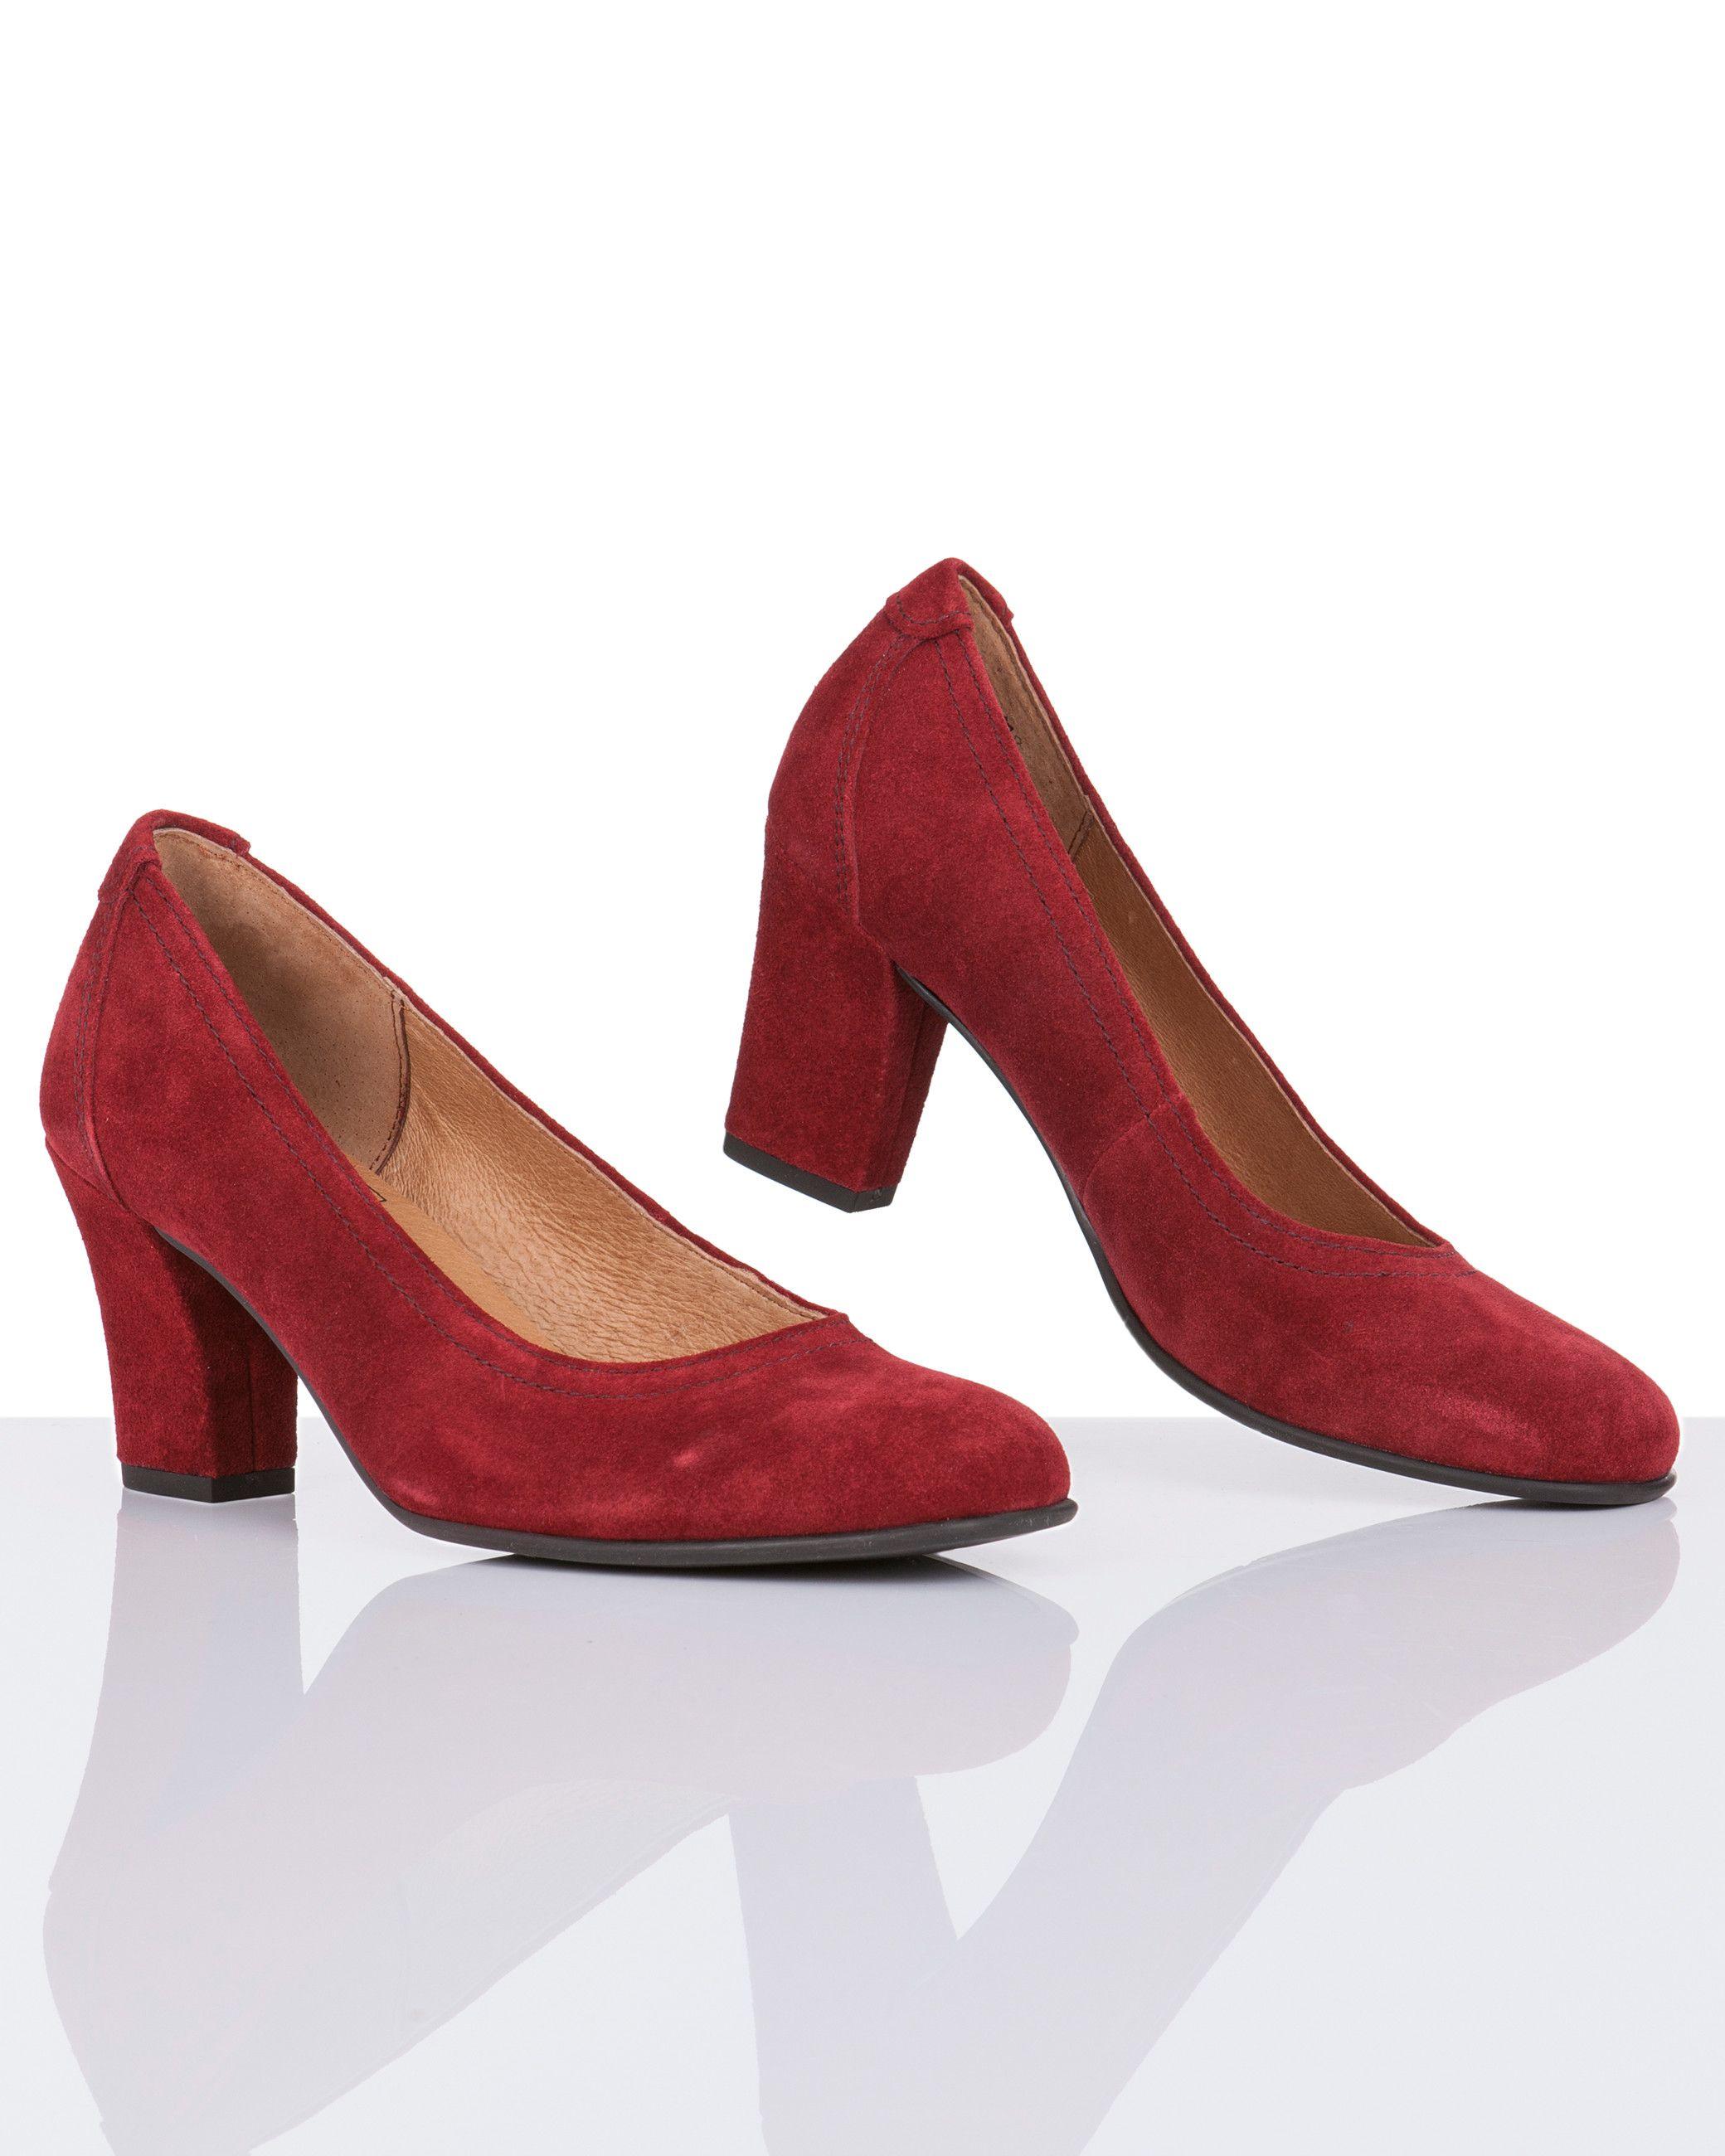 Caprice | Women's Fashion | rote Veloursleder Pumps | #HSE24